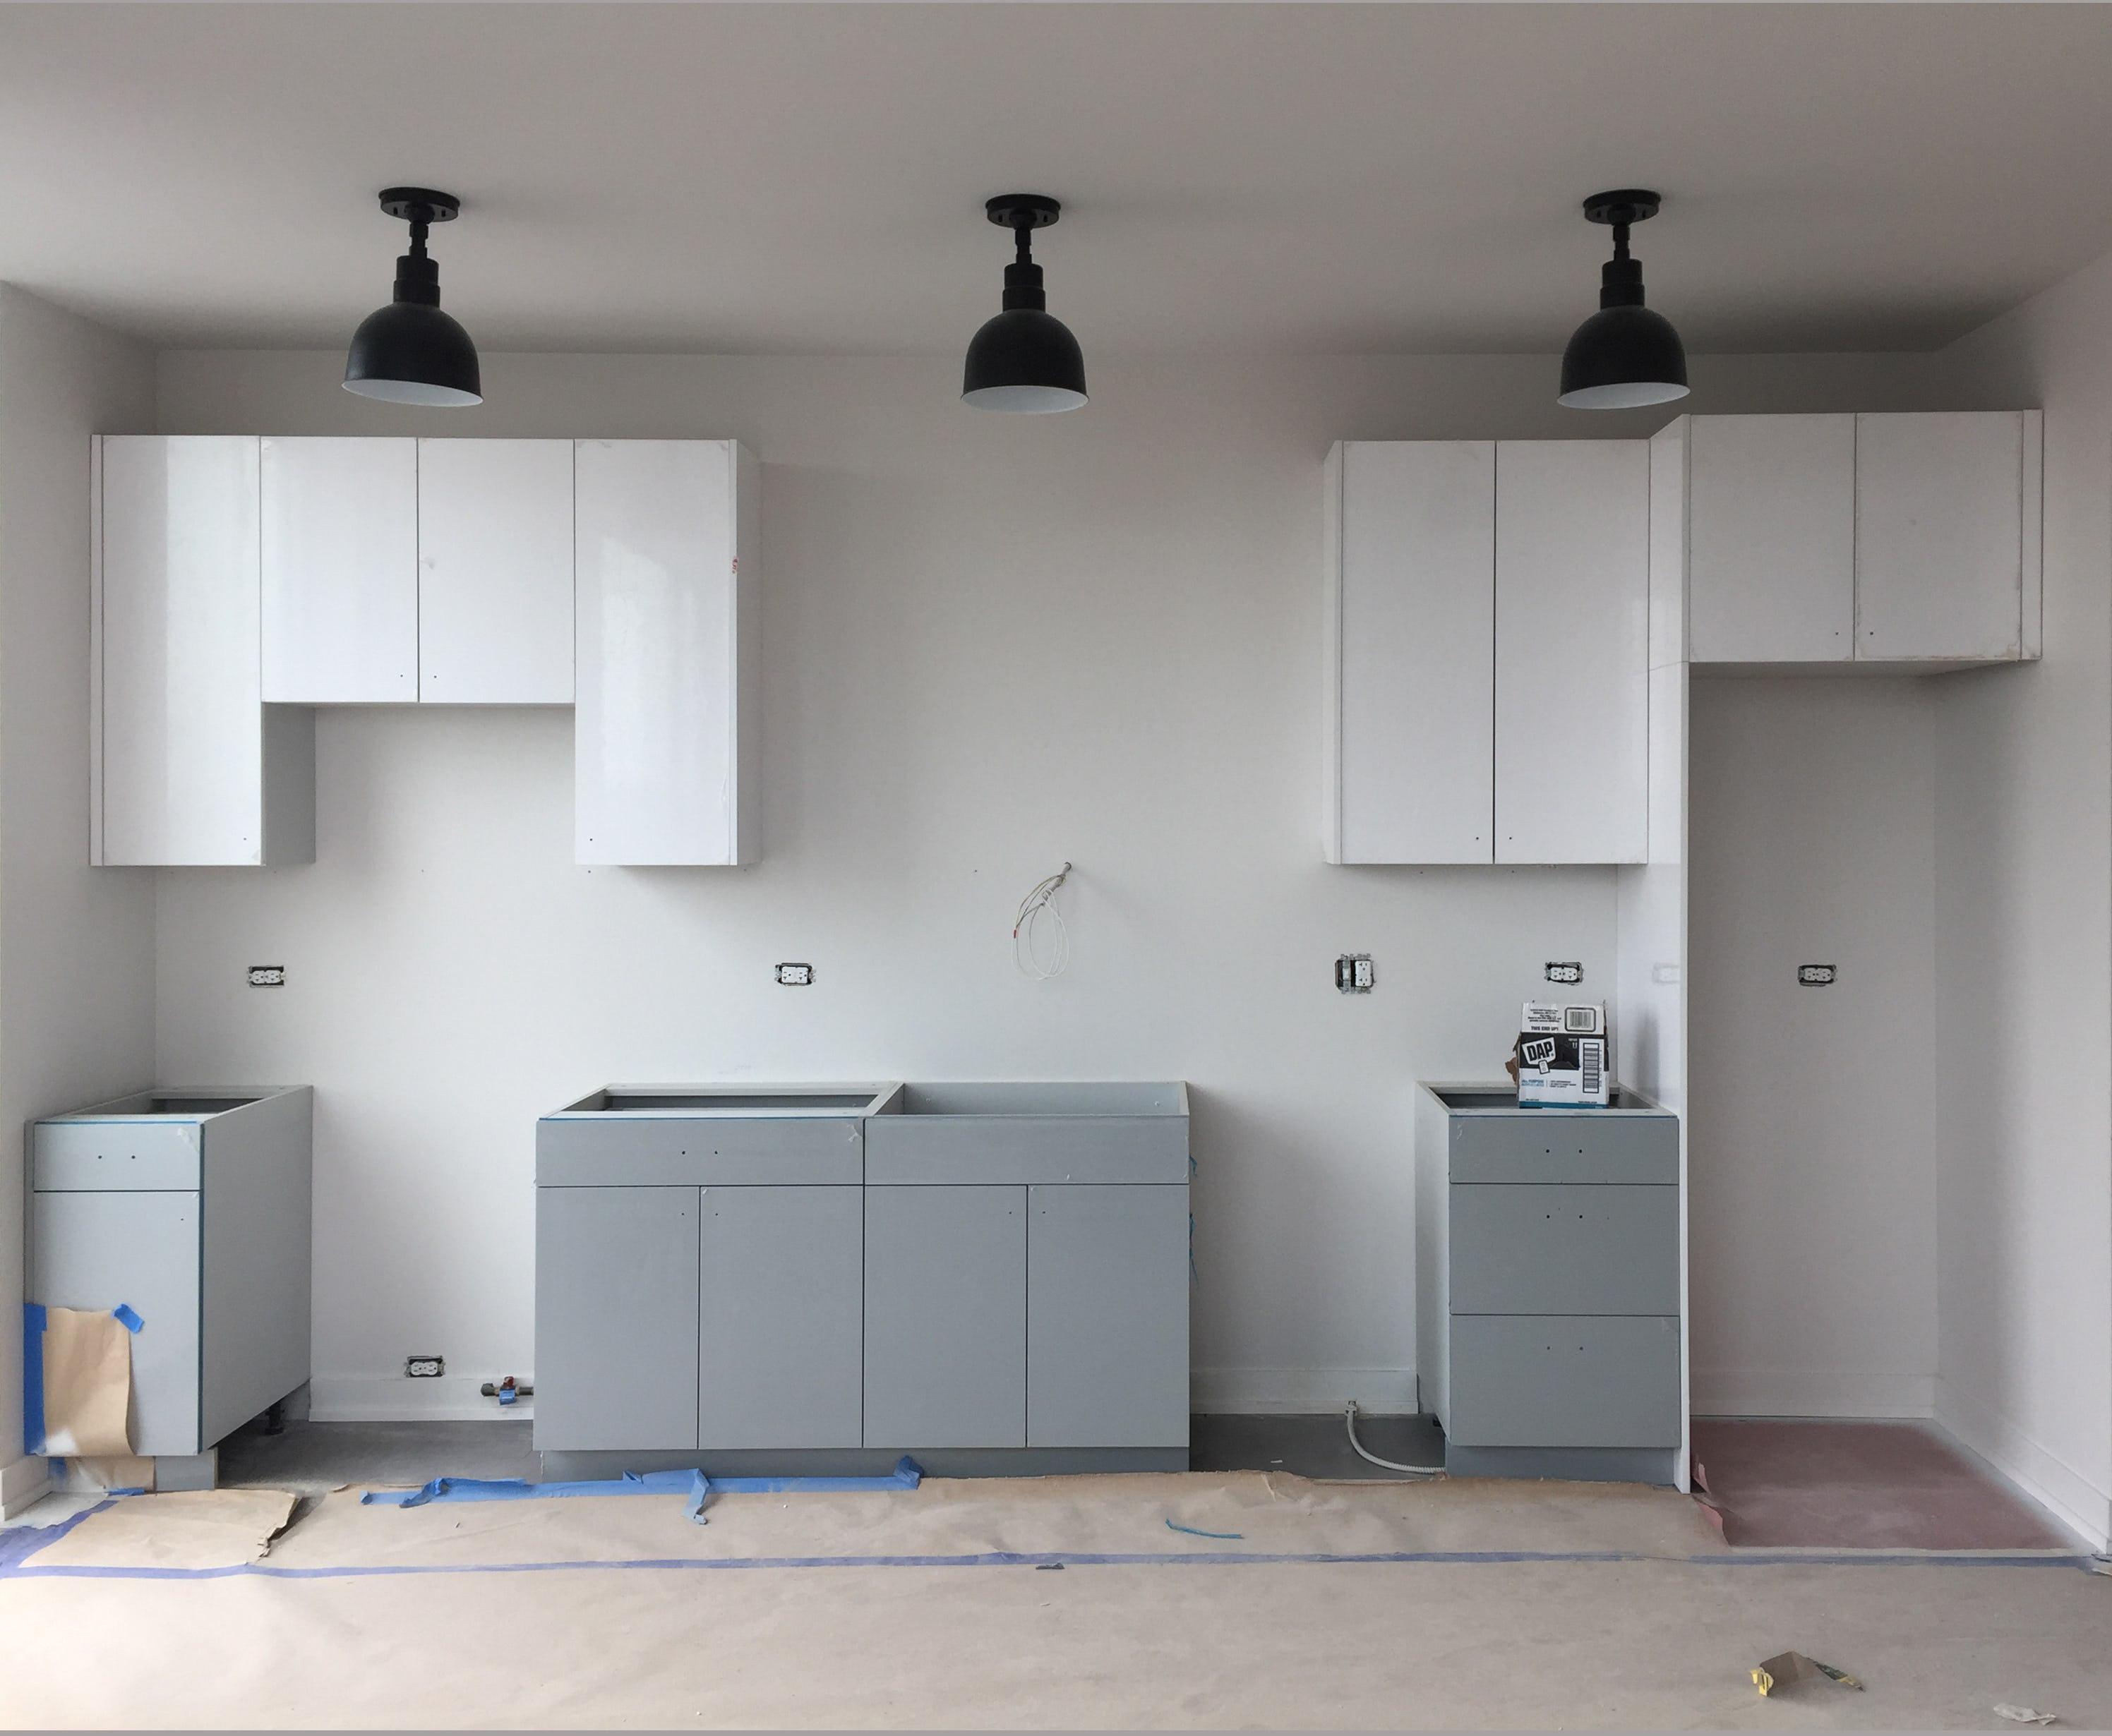 Level architecture inc 022019 montrose kitchen